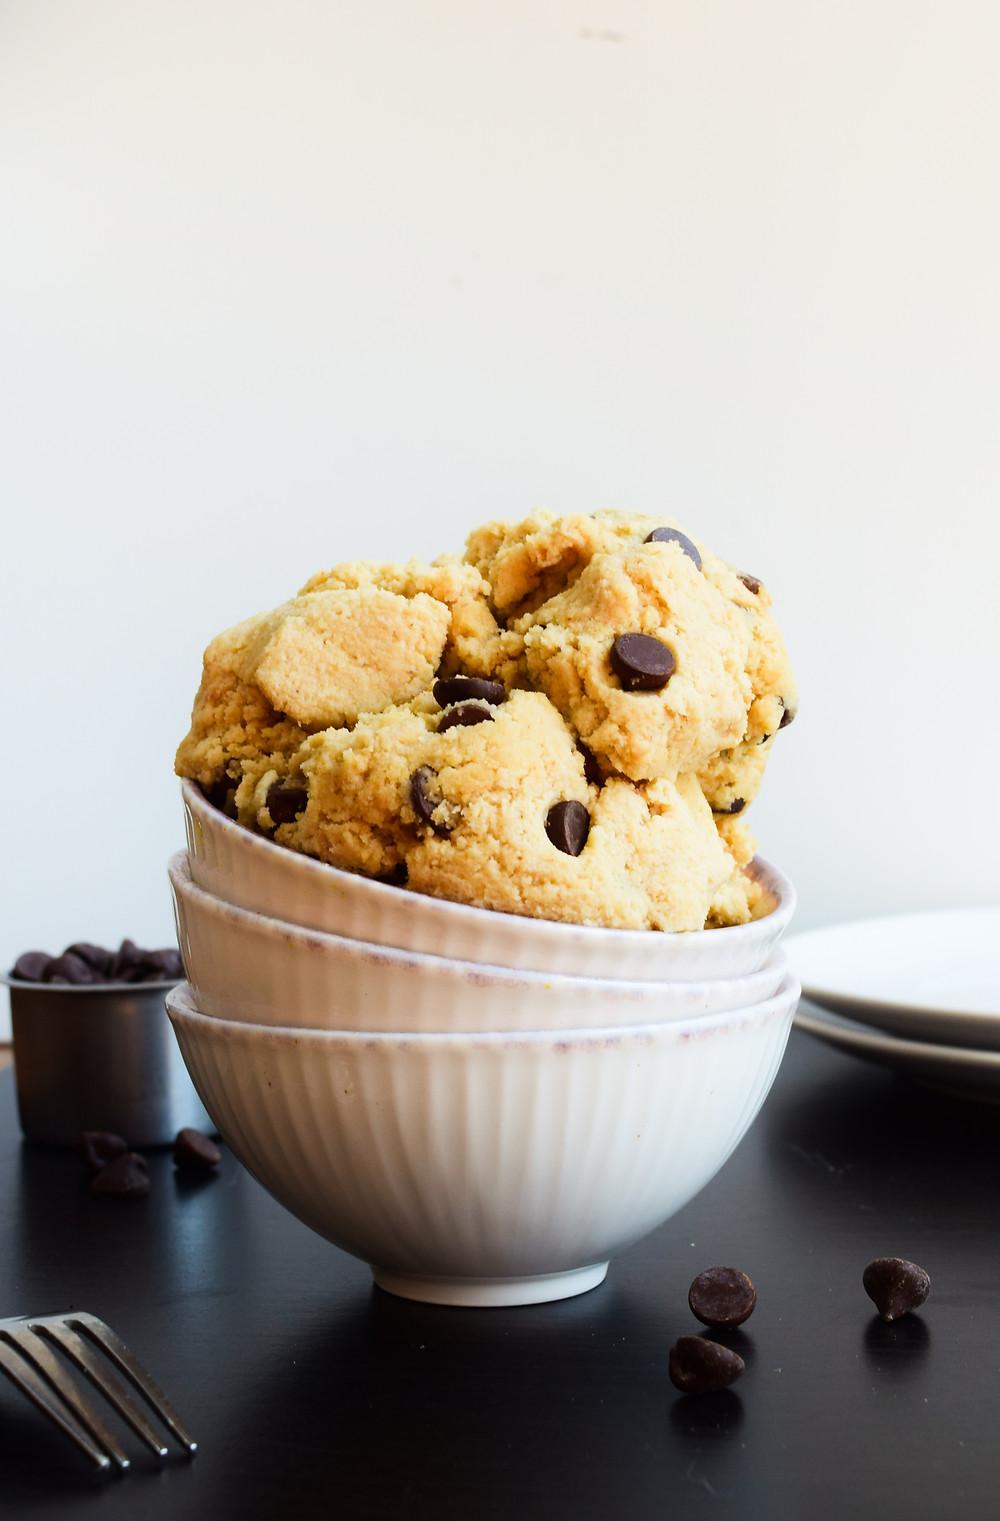 Edible Chocolate Chip Cookie Dough (Vegan, Paleo, Gluten-Free)